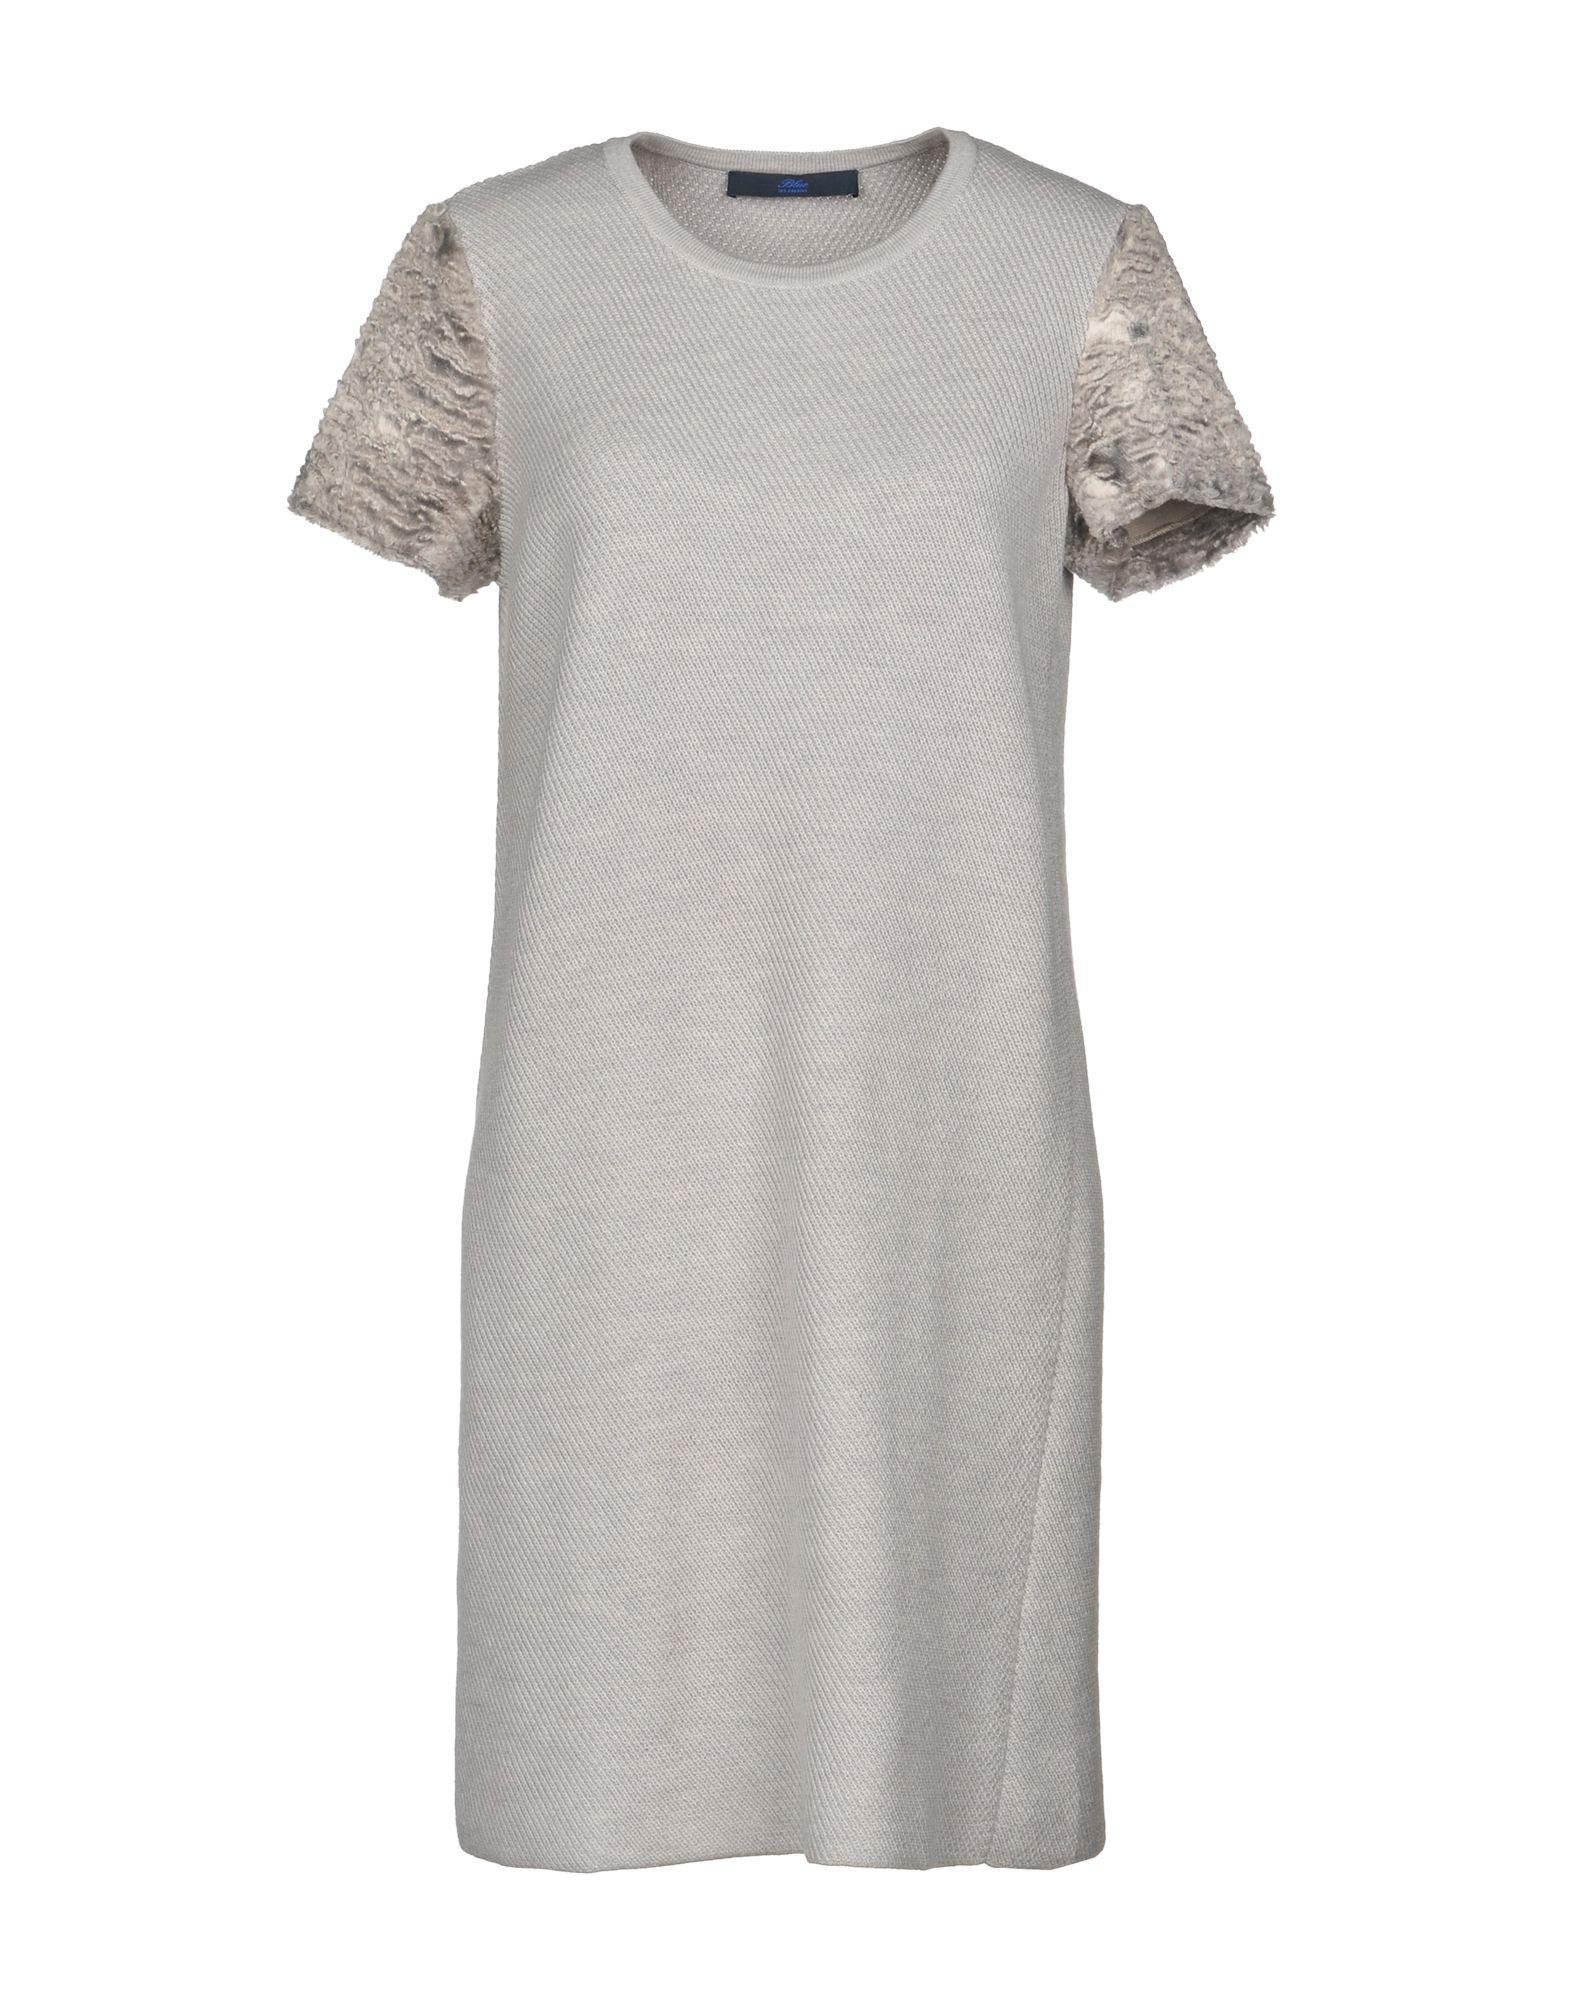 Lyst Blue Les In Gray Short Copains Dress 8PqB8